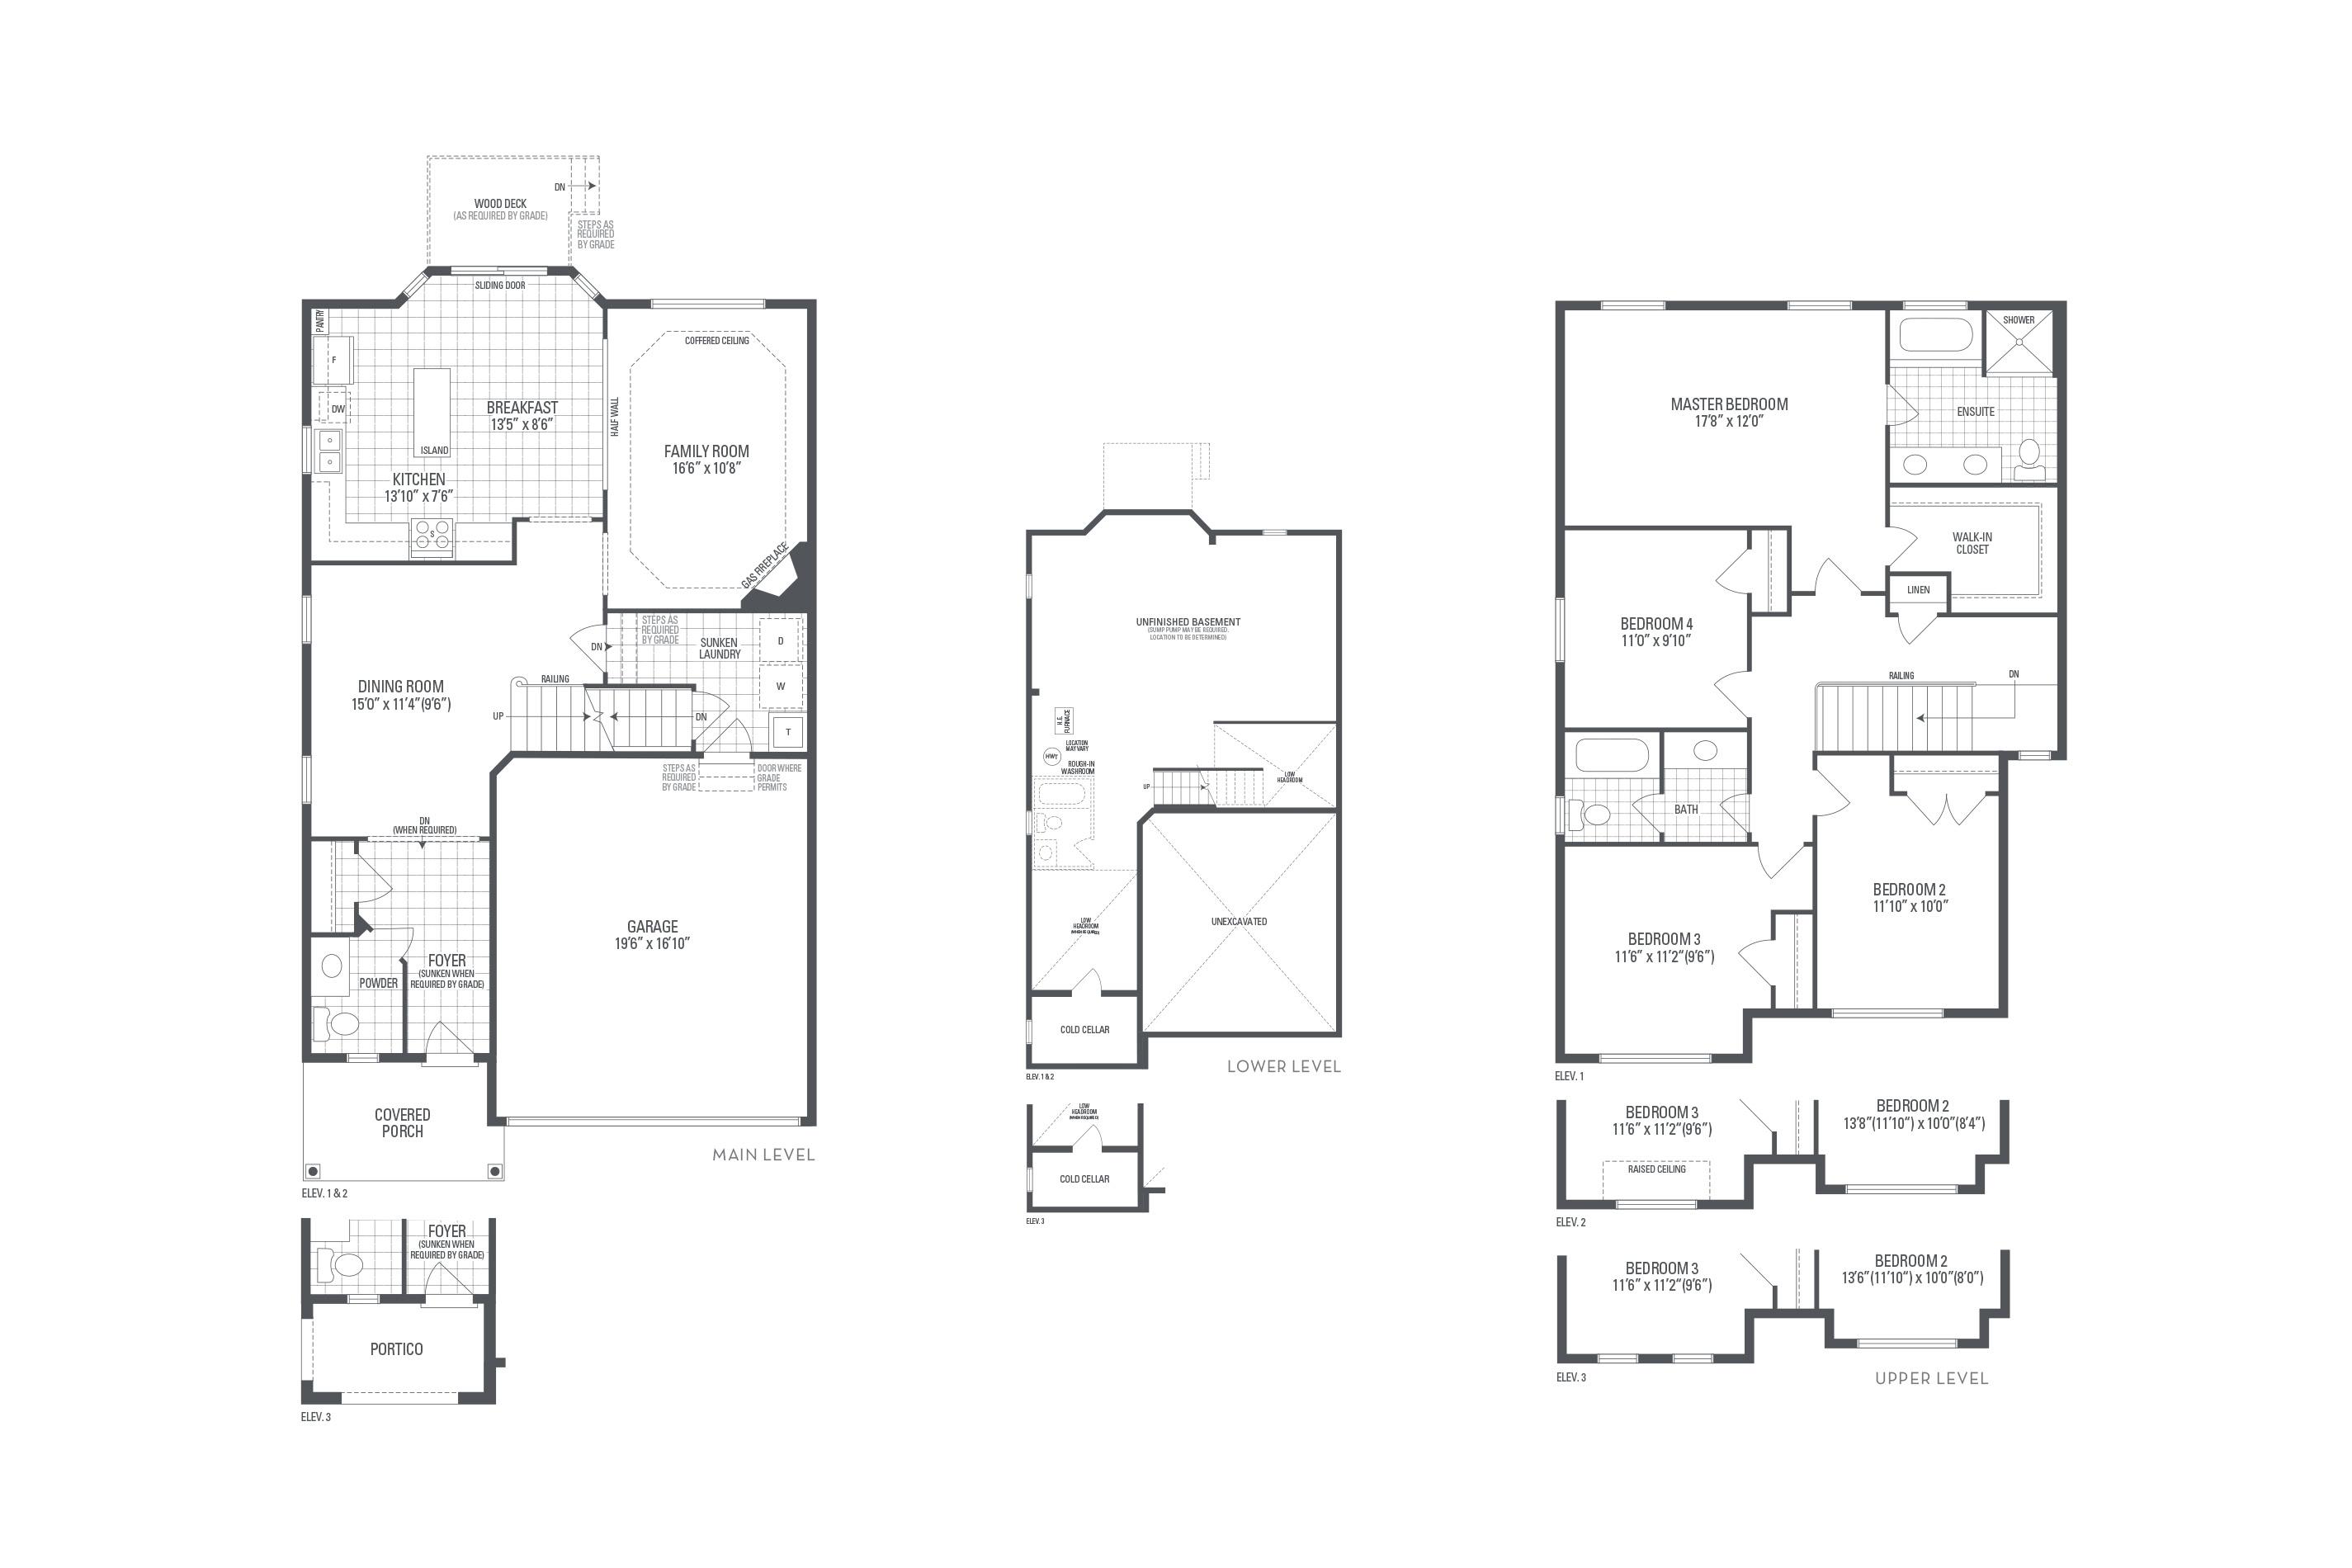 Bronte 02 Elev. 2 Floorplan